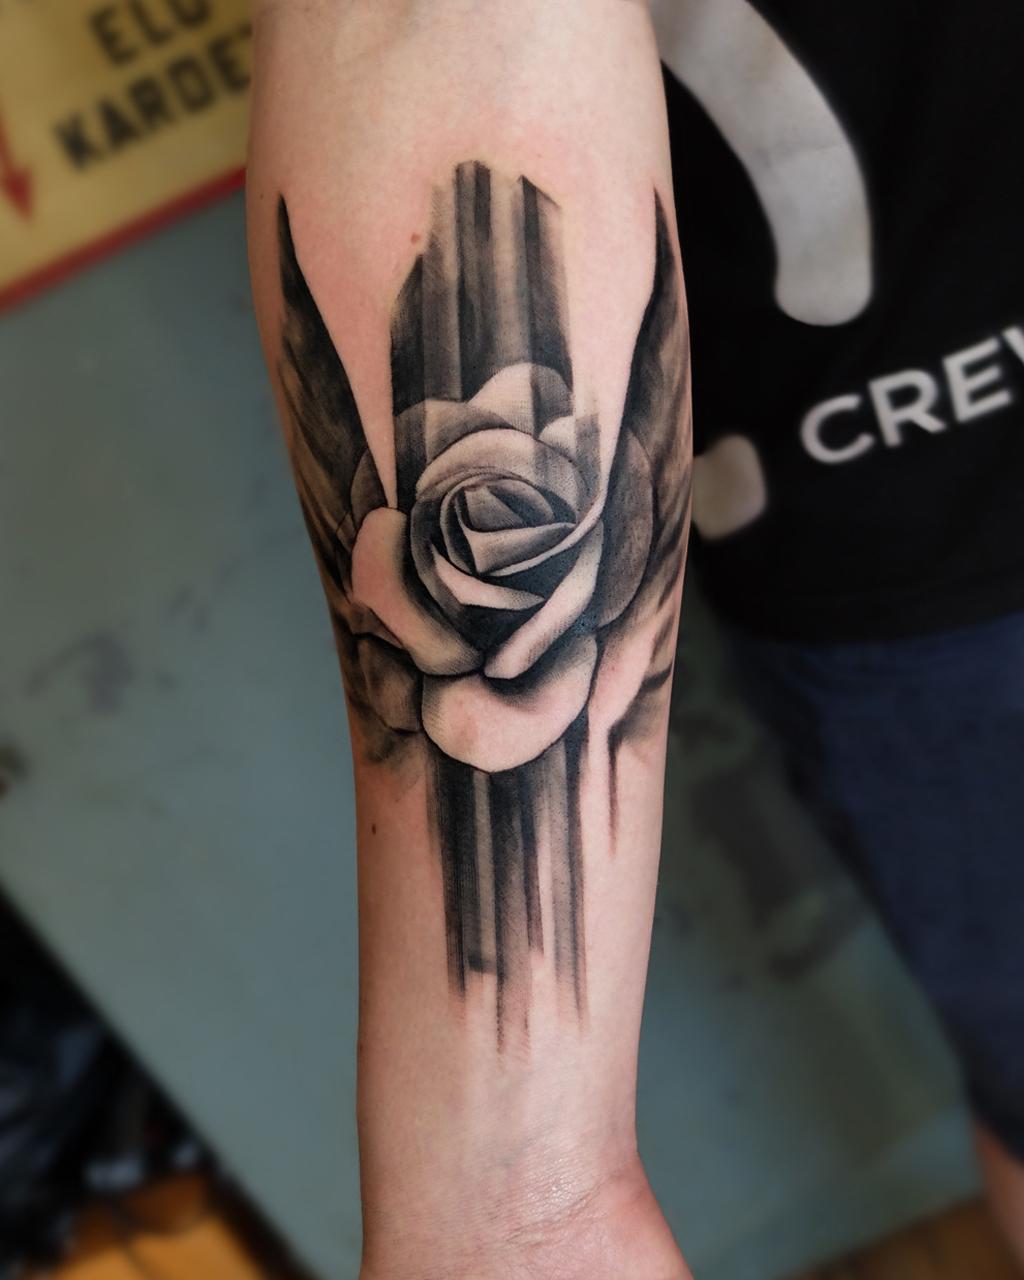 Oliverroos Soulmark Tattoo Barber